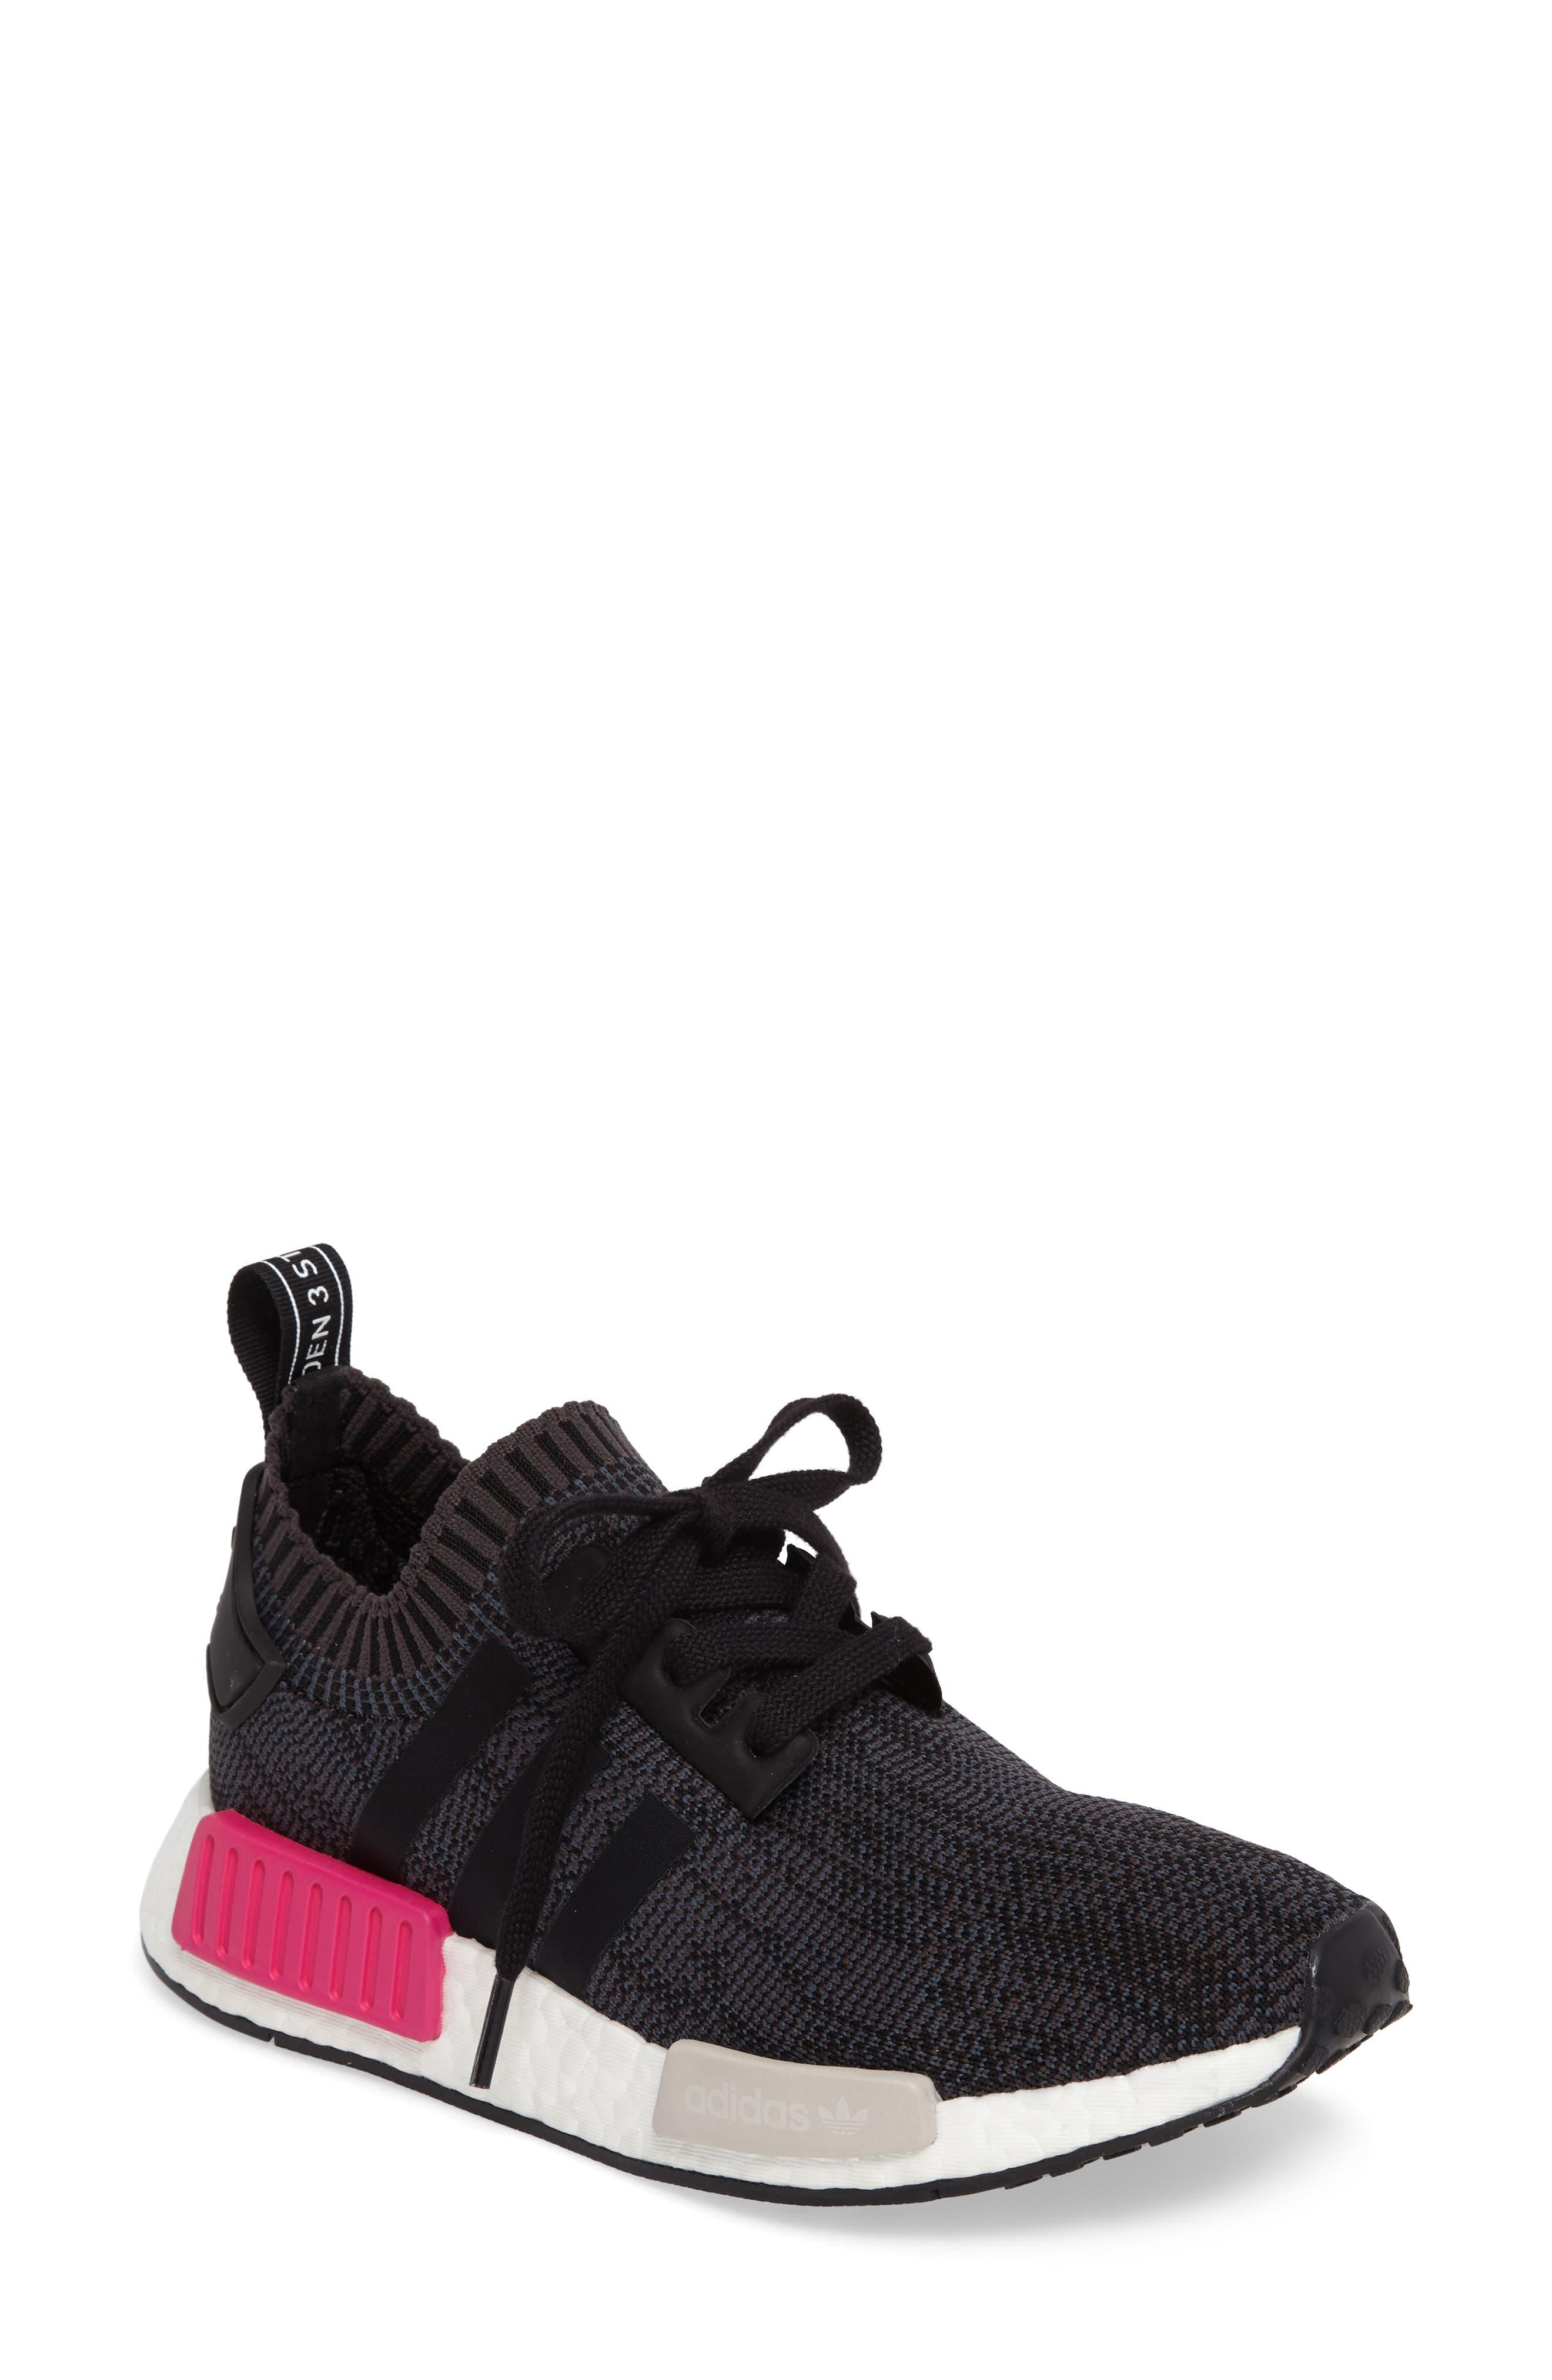 adidas NMD R1 Athletic Shoe (Women)